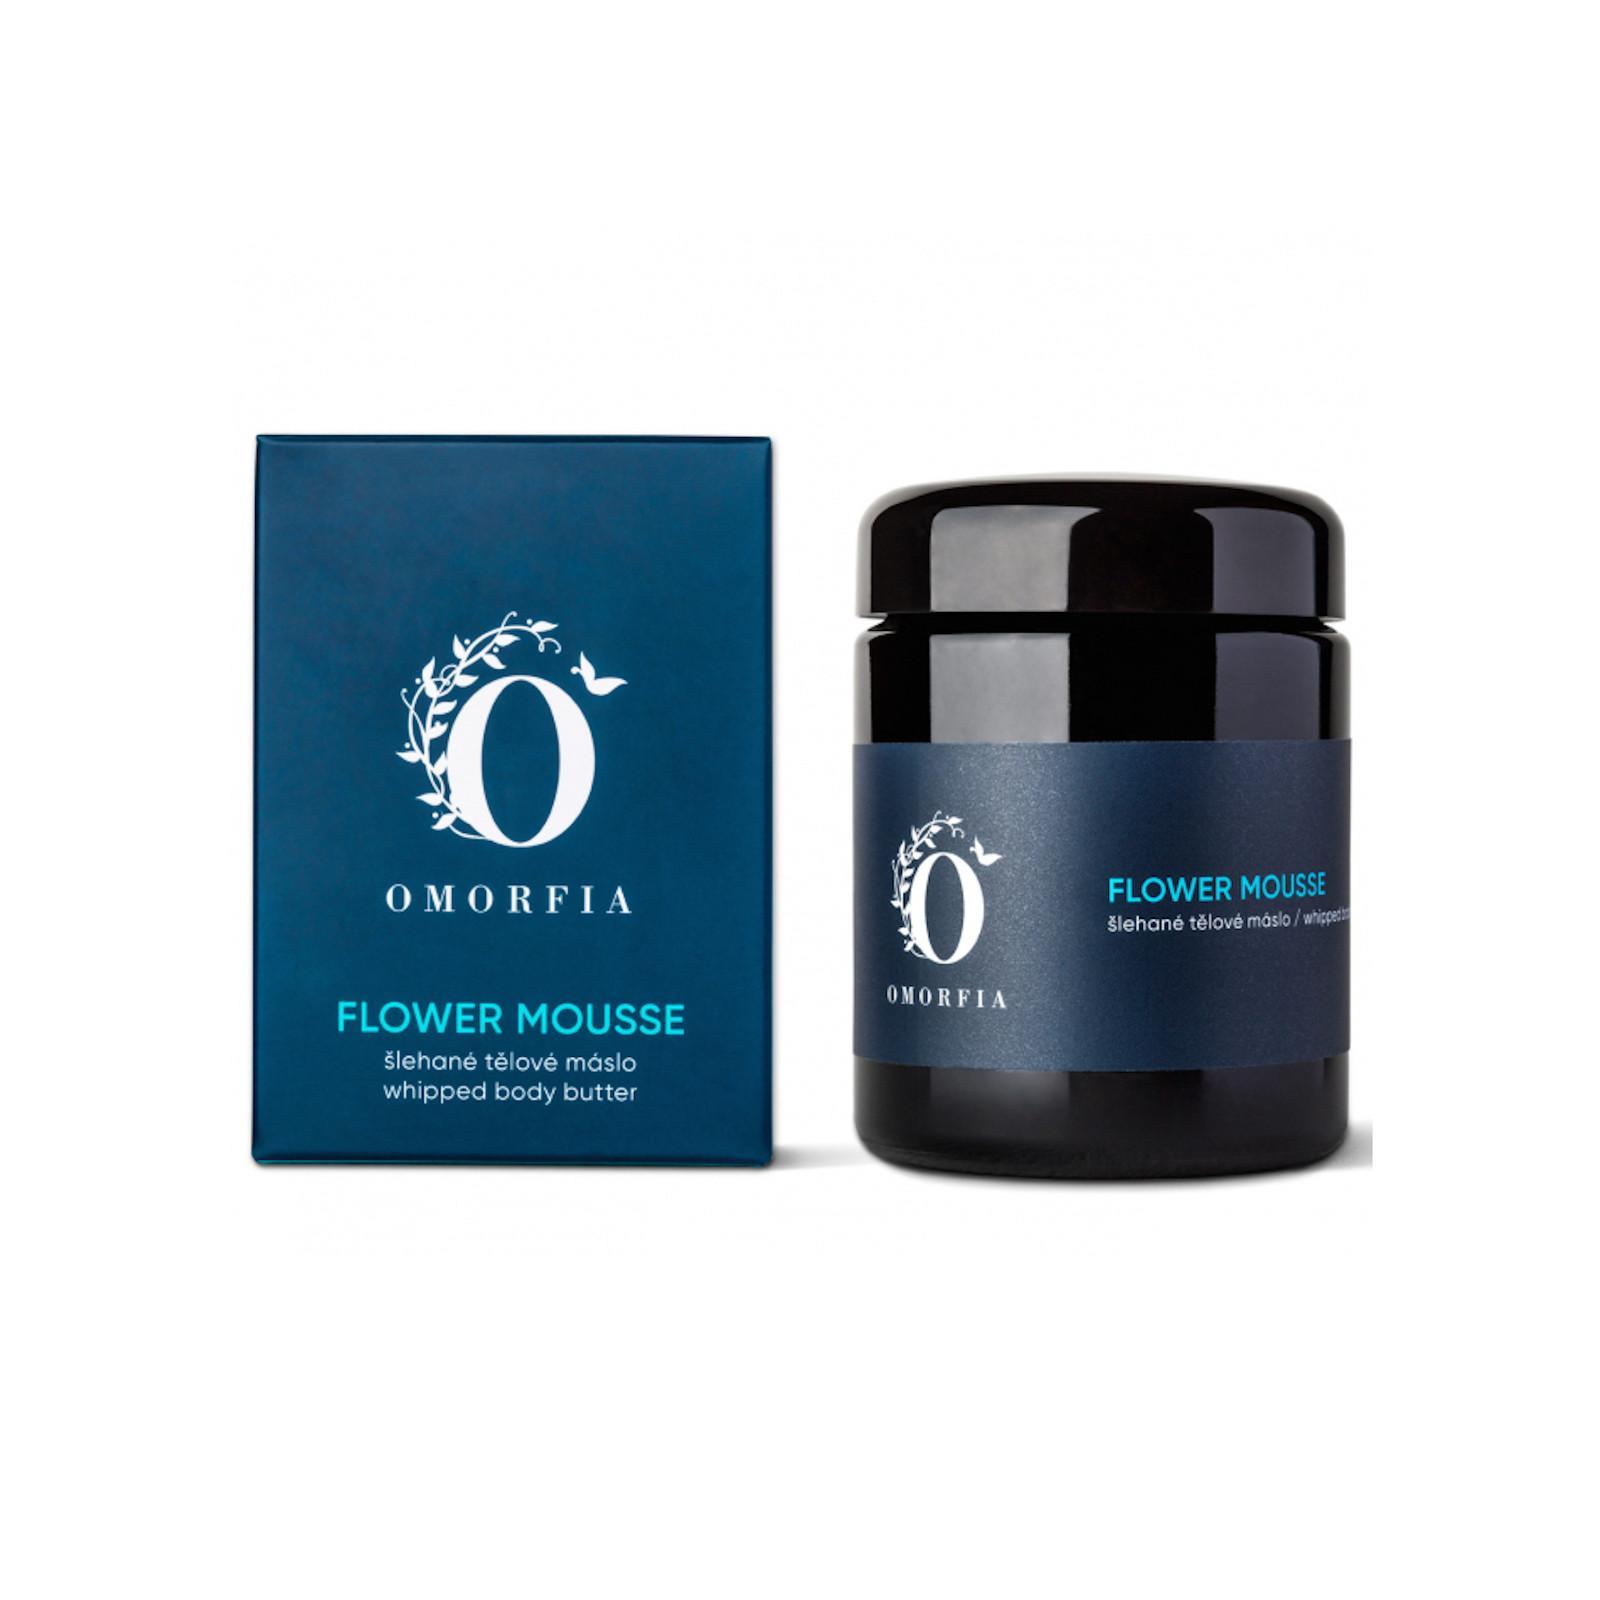 Omorfia Flower mousse, tělové máslo 250 ml